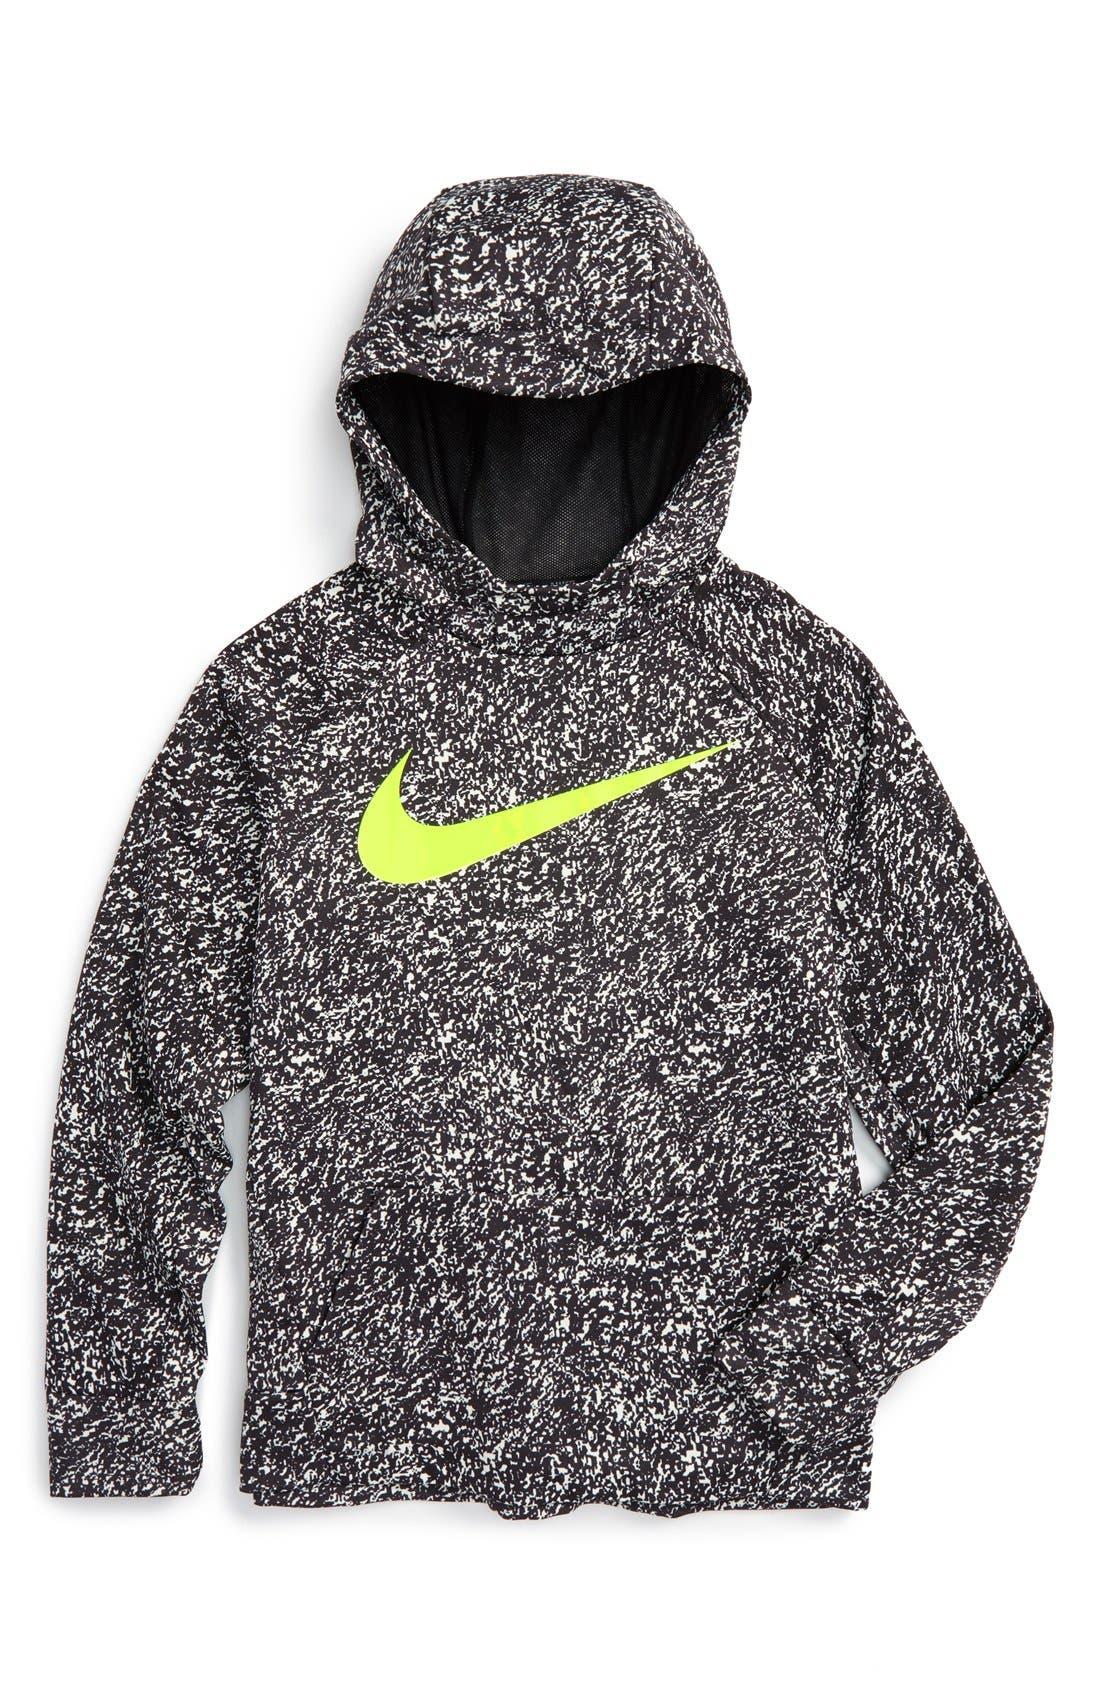 Main Image - Nike Thermal Dri-FIT Hoodie (Little Boys & Big Boys) (Regular Retail Price: $50.00)